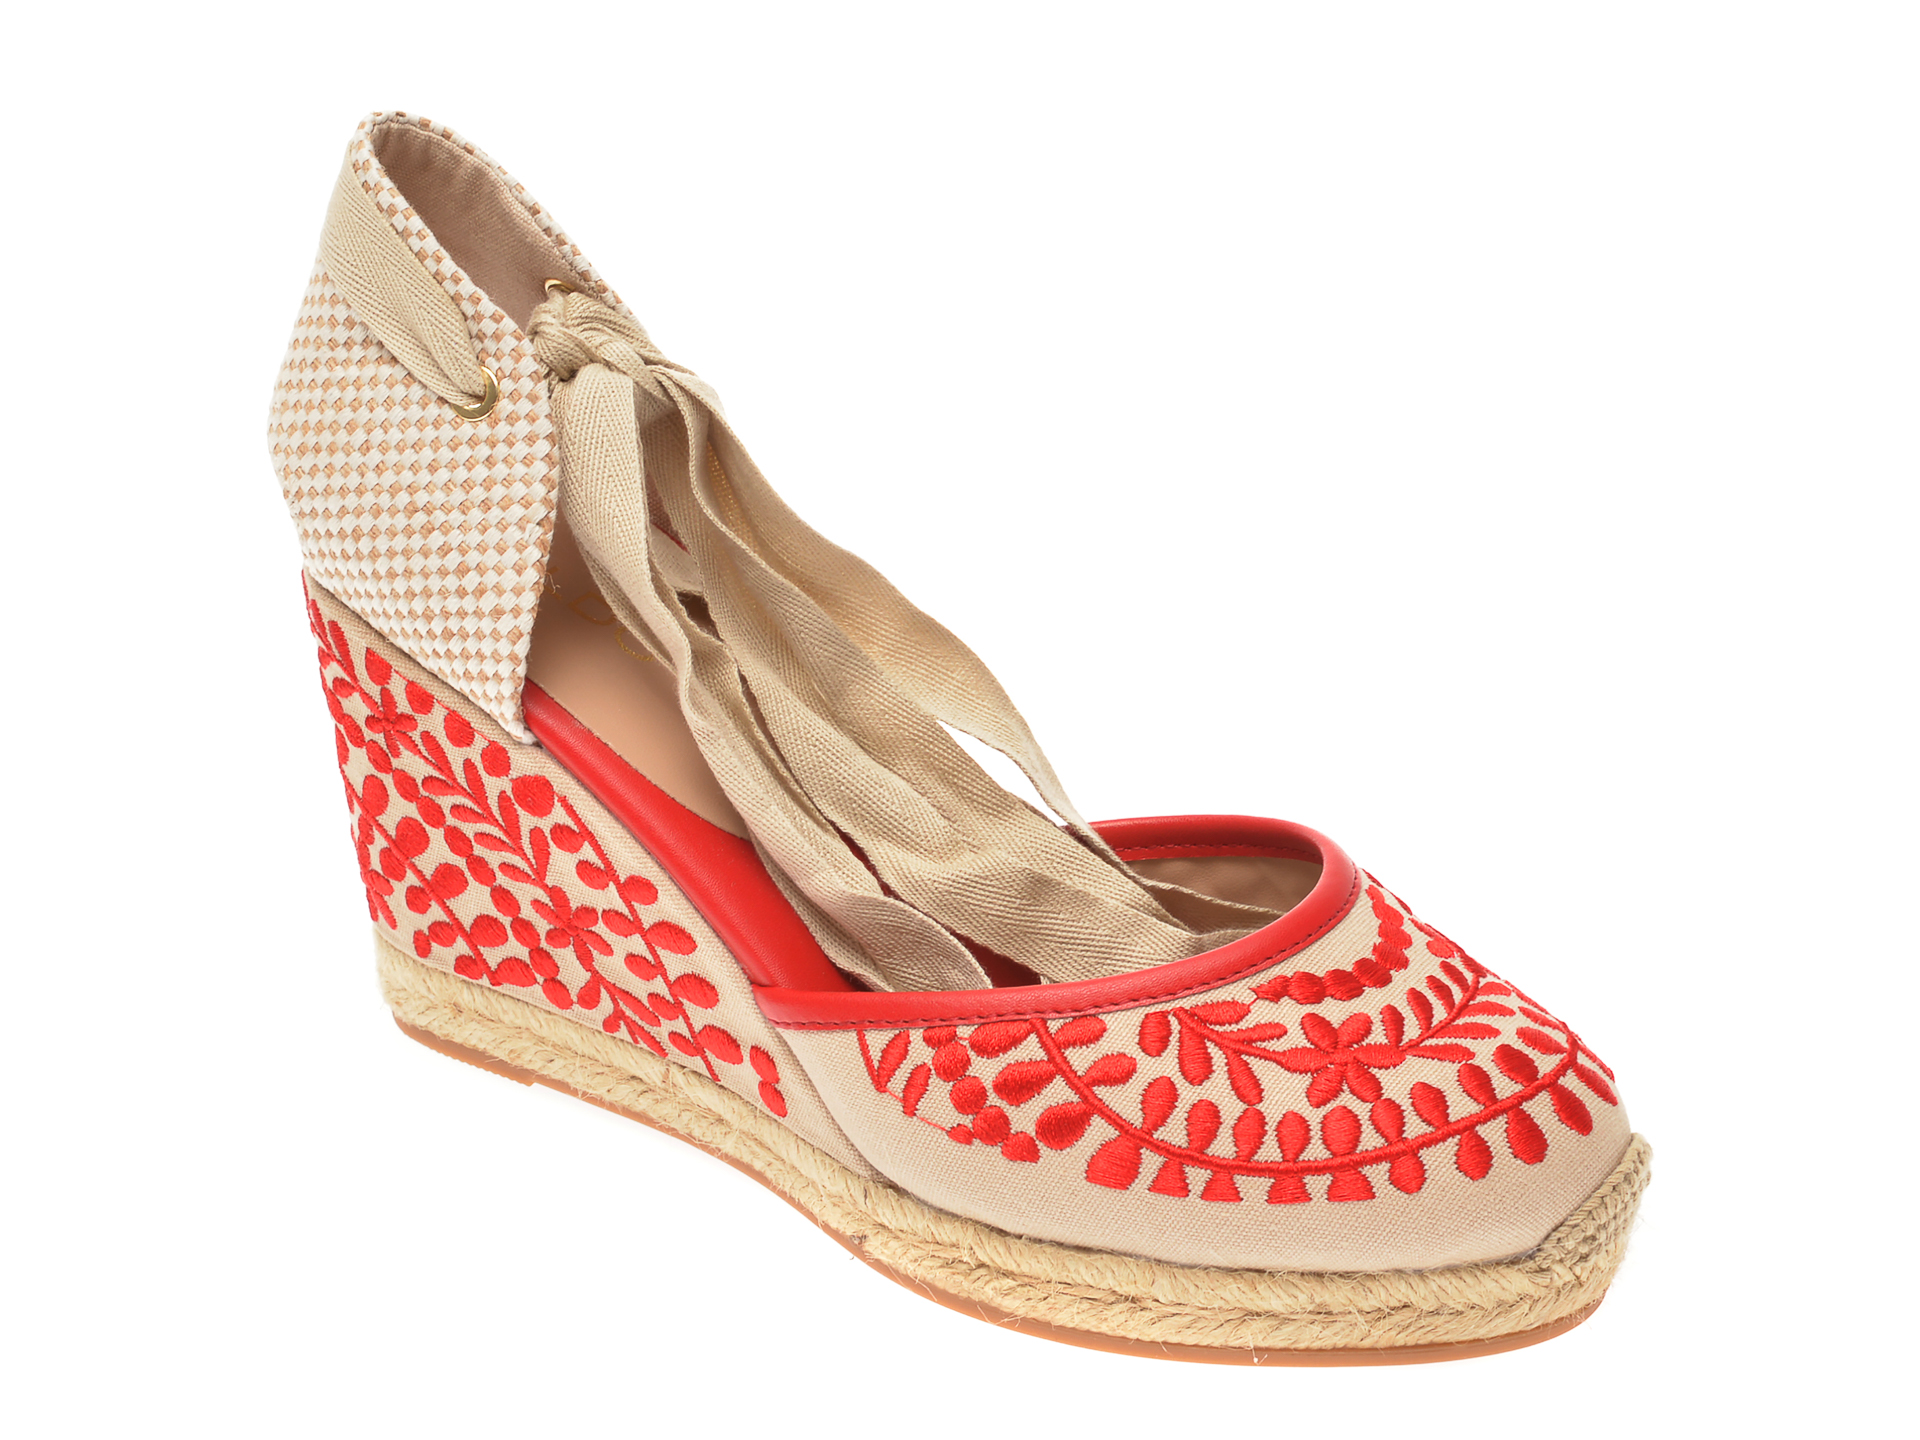 Pantofi ALDO rosii, Muschino600, din material textil imagine